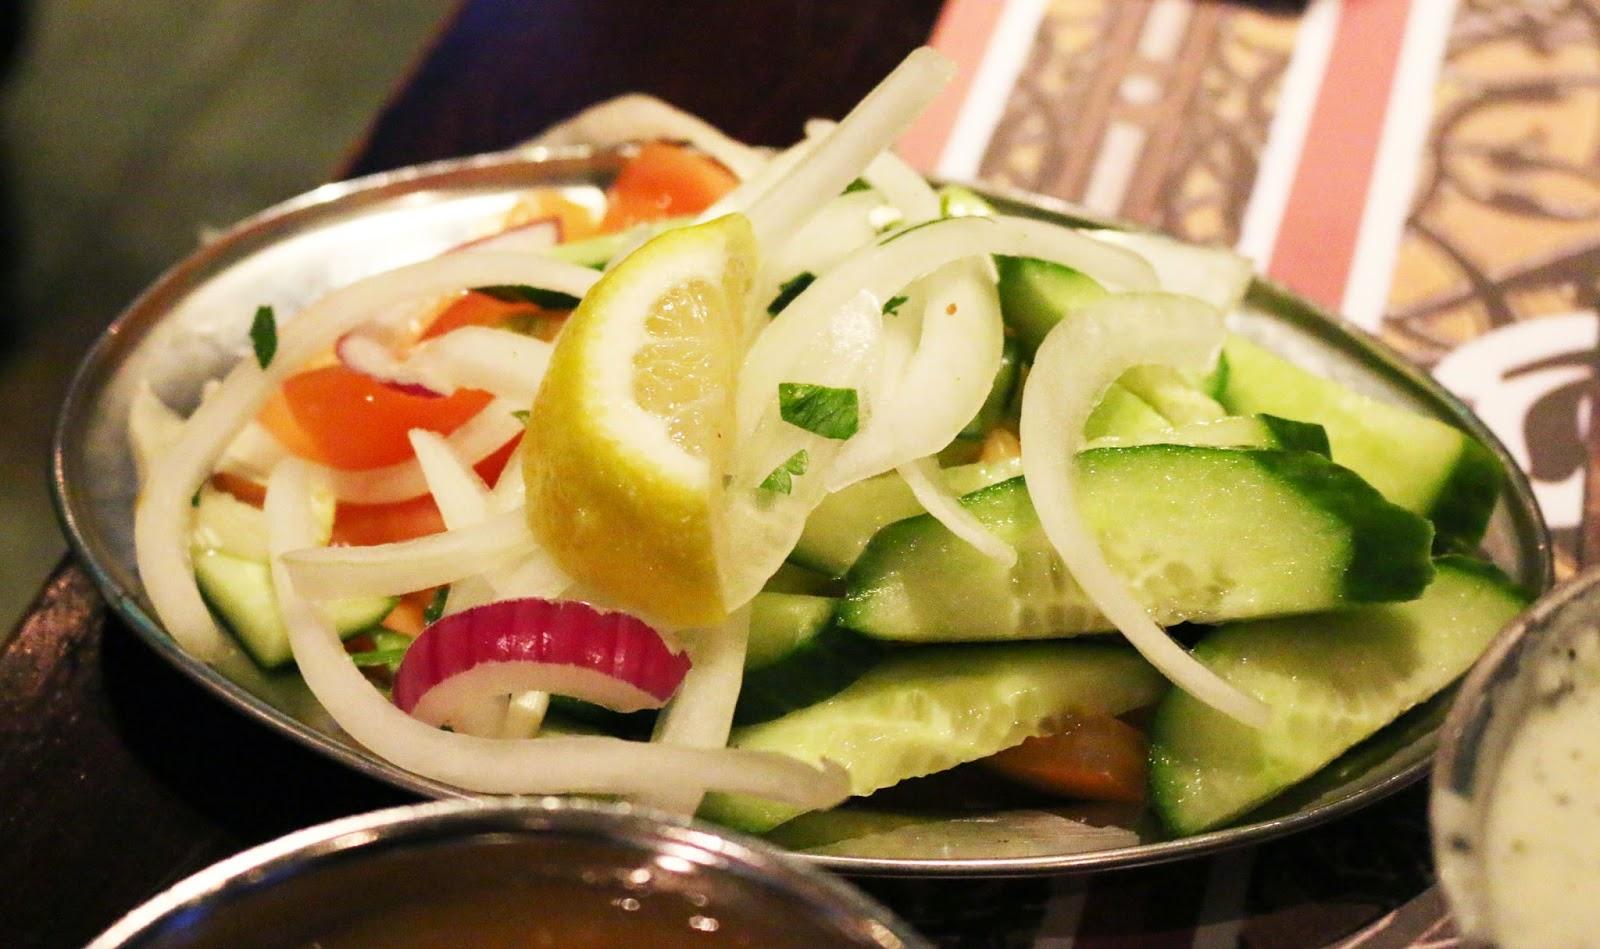 Tayyabs - Salad